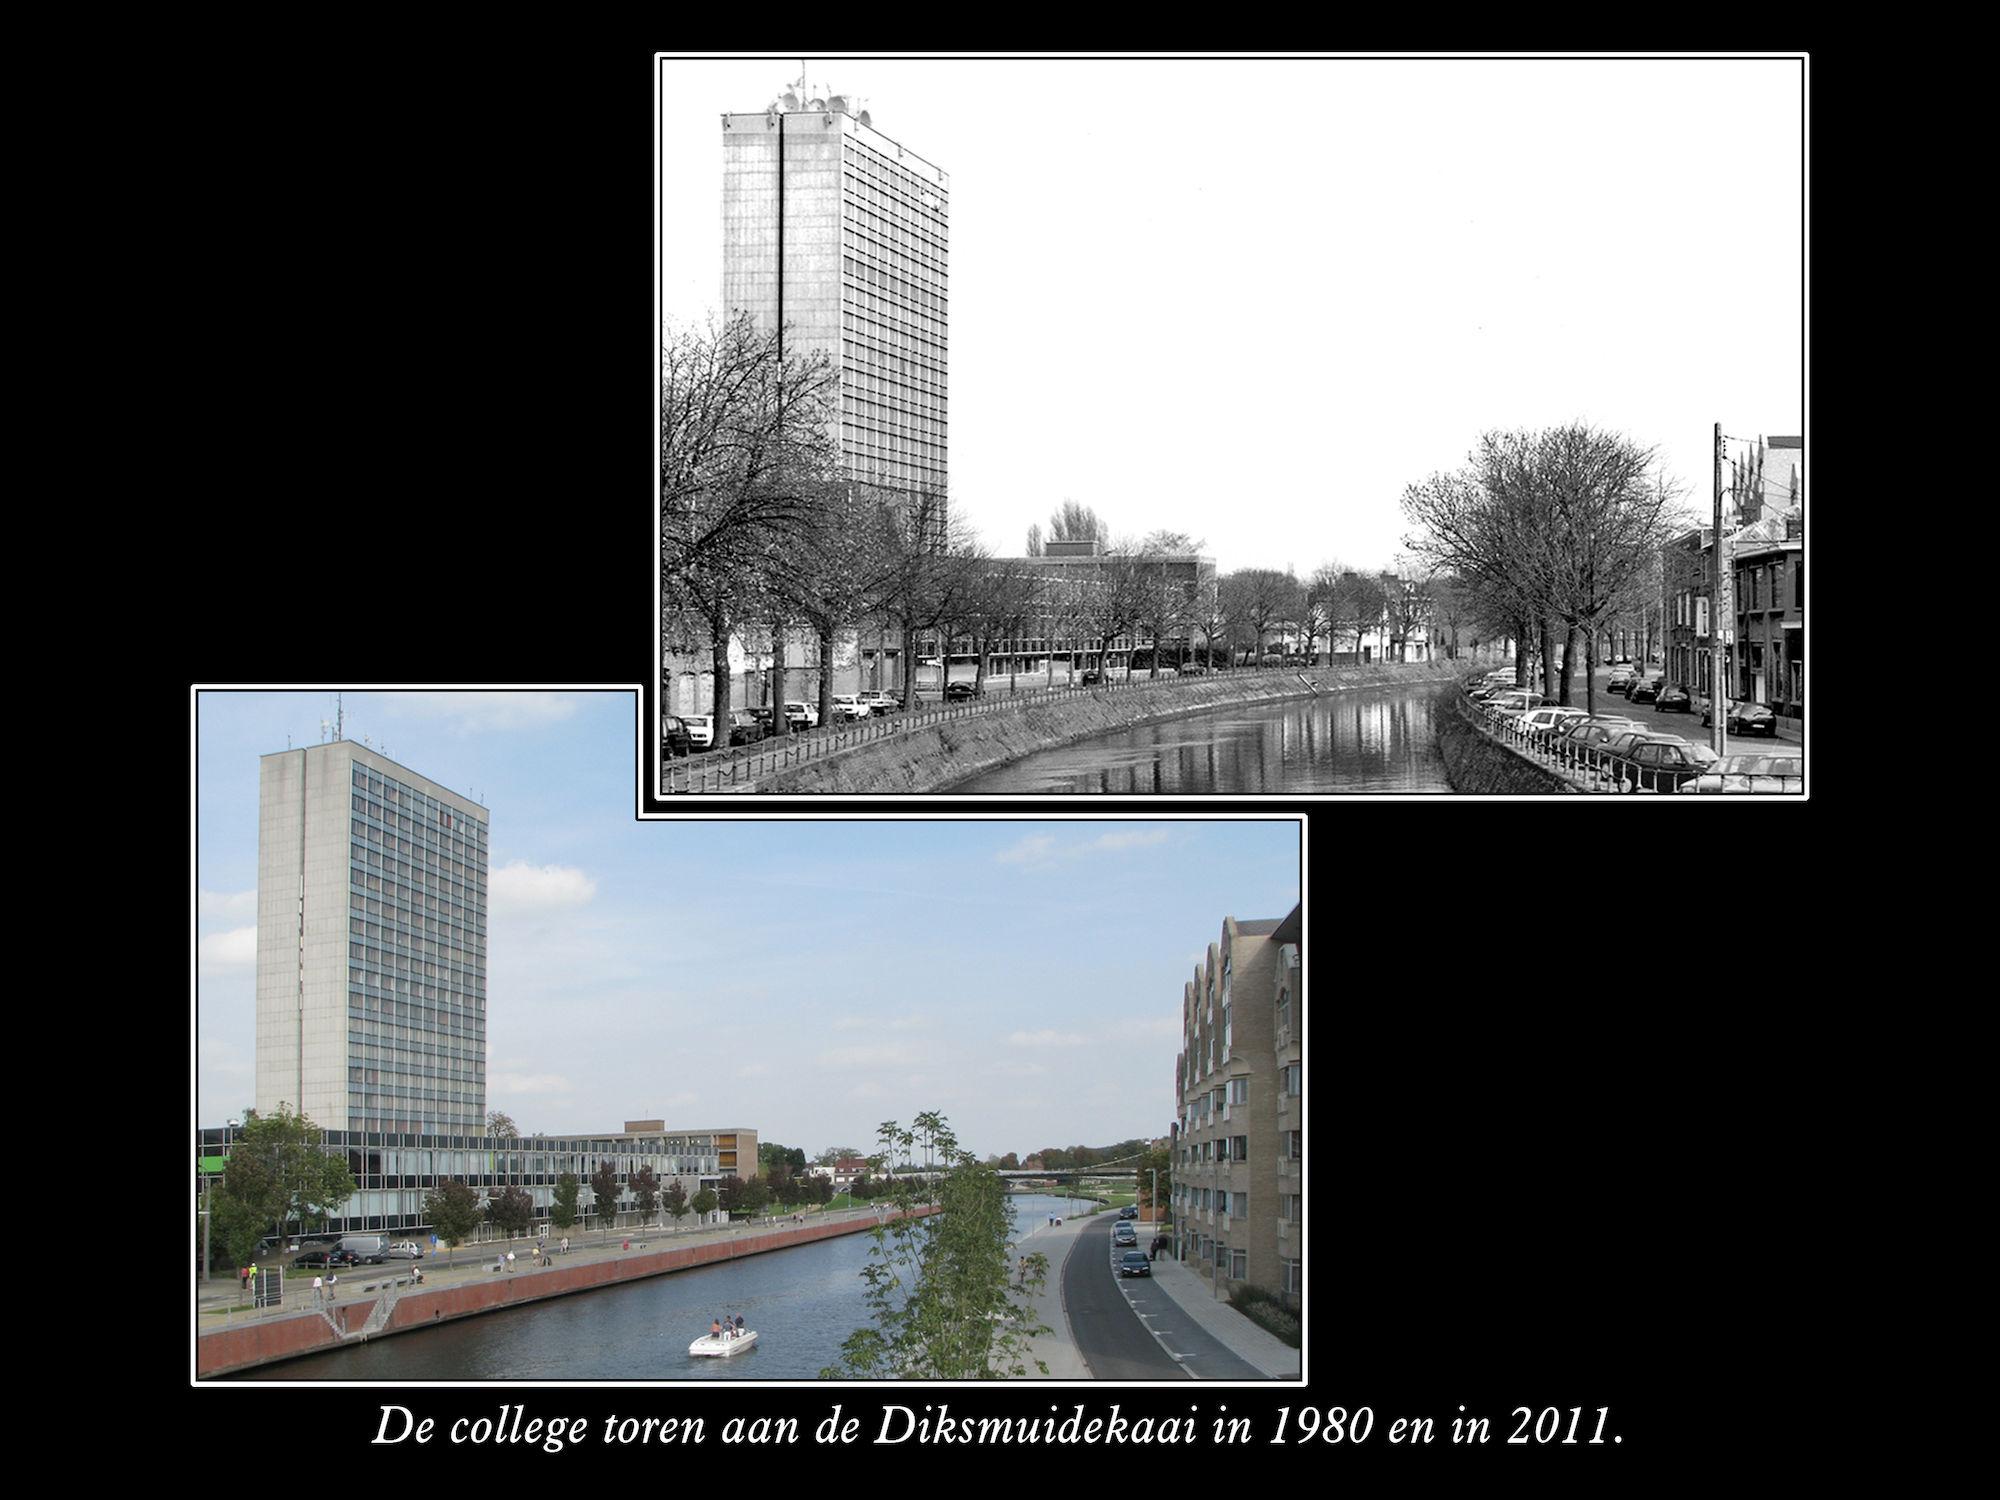 Diksmuidekaai 1980 2011